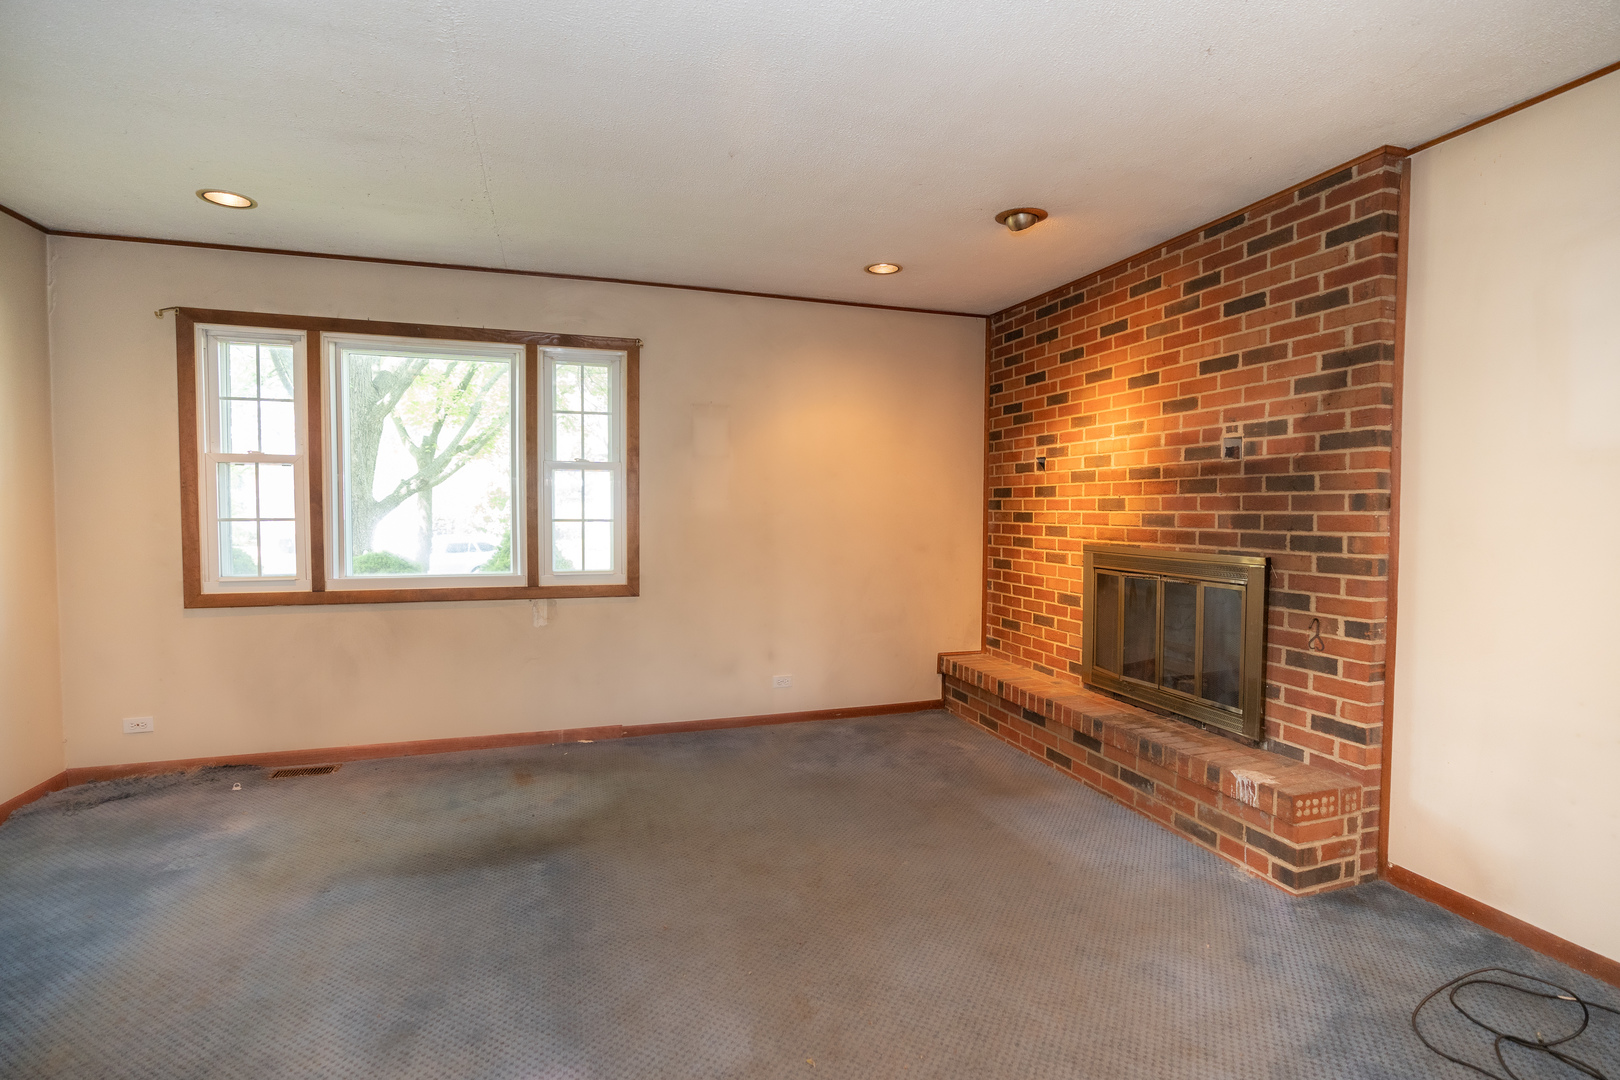 284 Redwood, ELK GROVE VILLAGE, Illinois, 60007